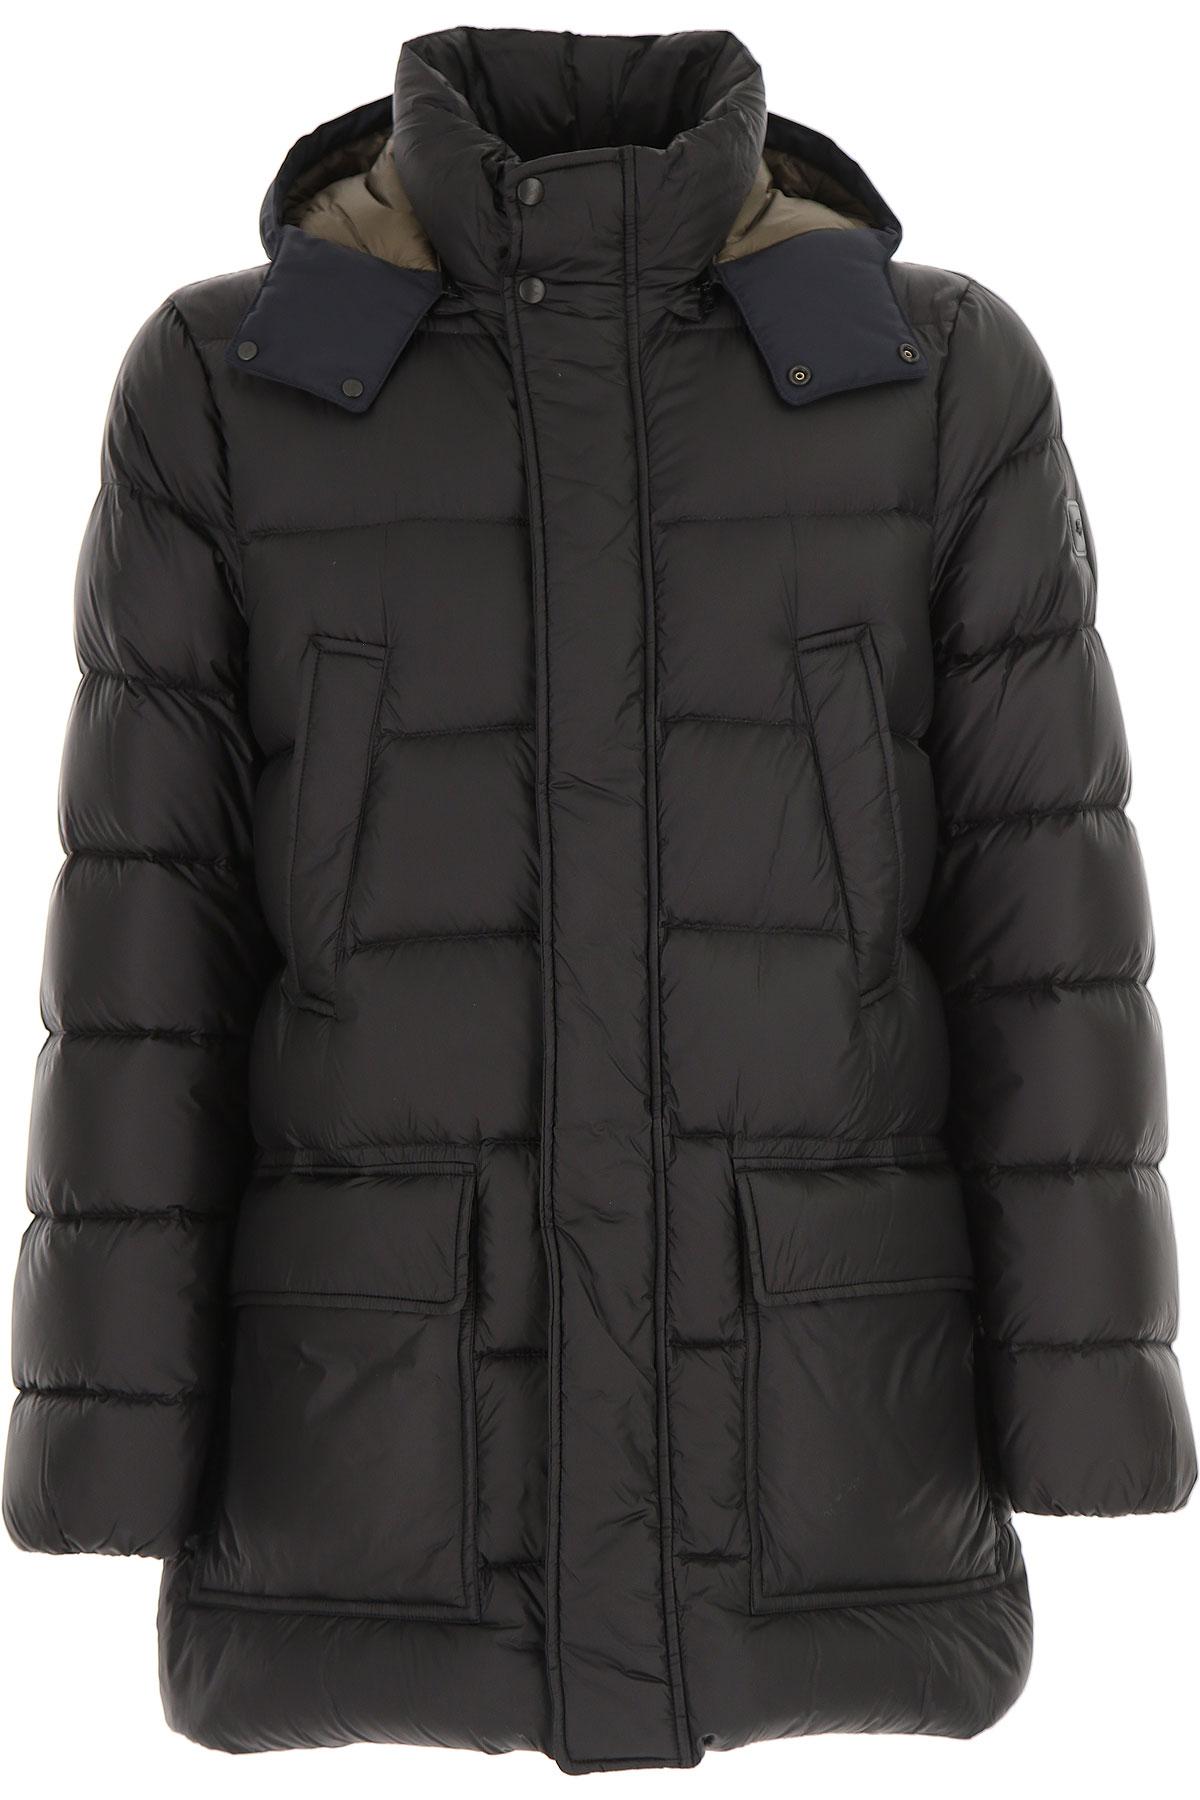 Image of Fay Down Jacket for Men, Puffer Ski Jacket, Black, Down, 2017, L M XL